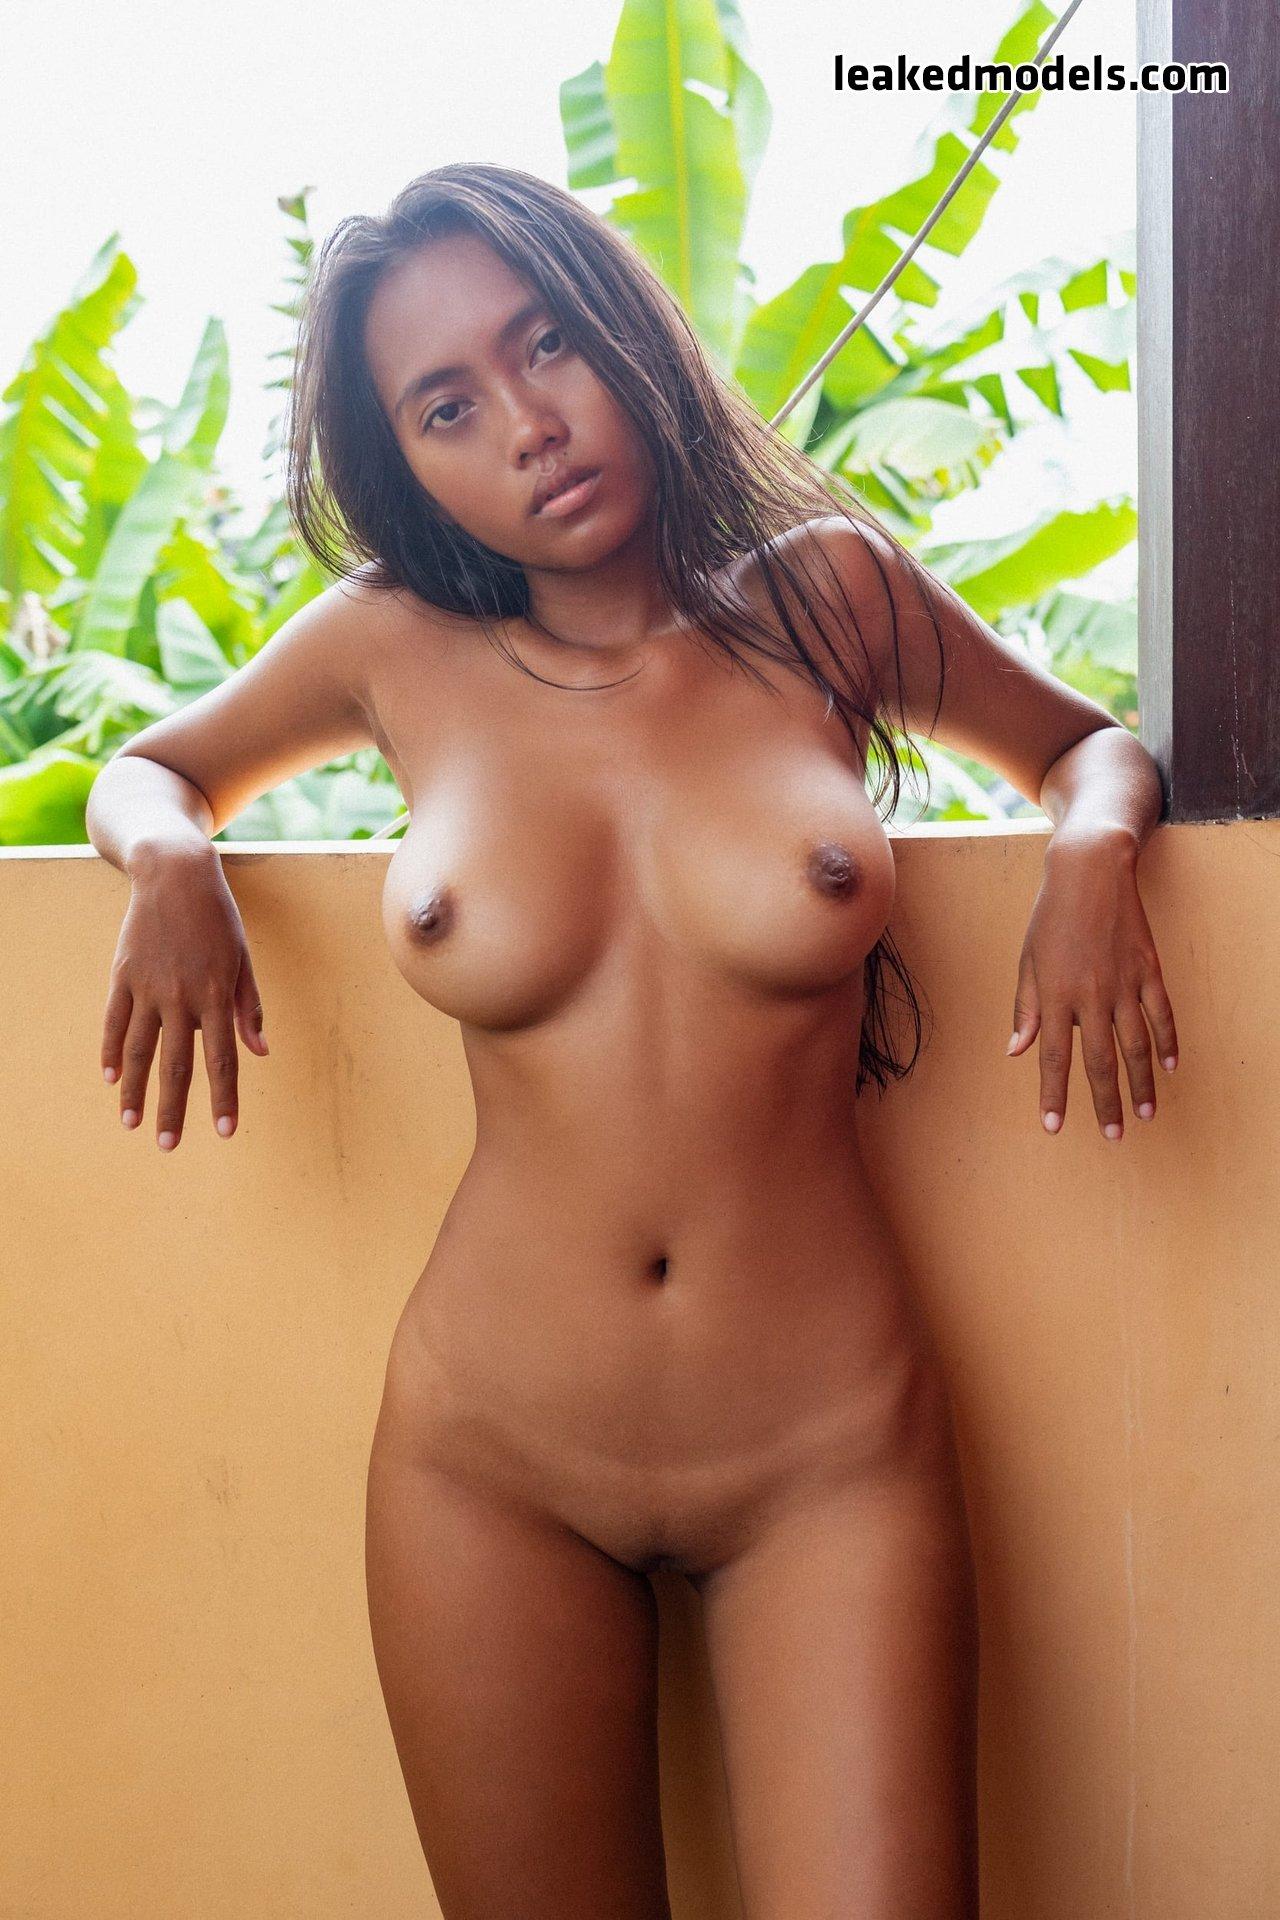 yourislandbabes Patreon Nude Leaks (35 Photos)